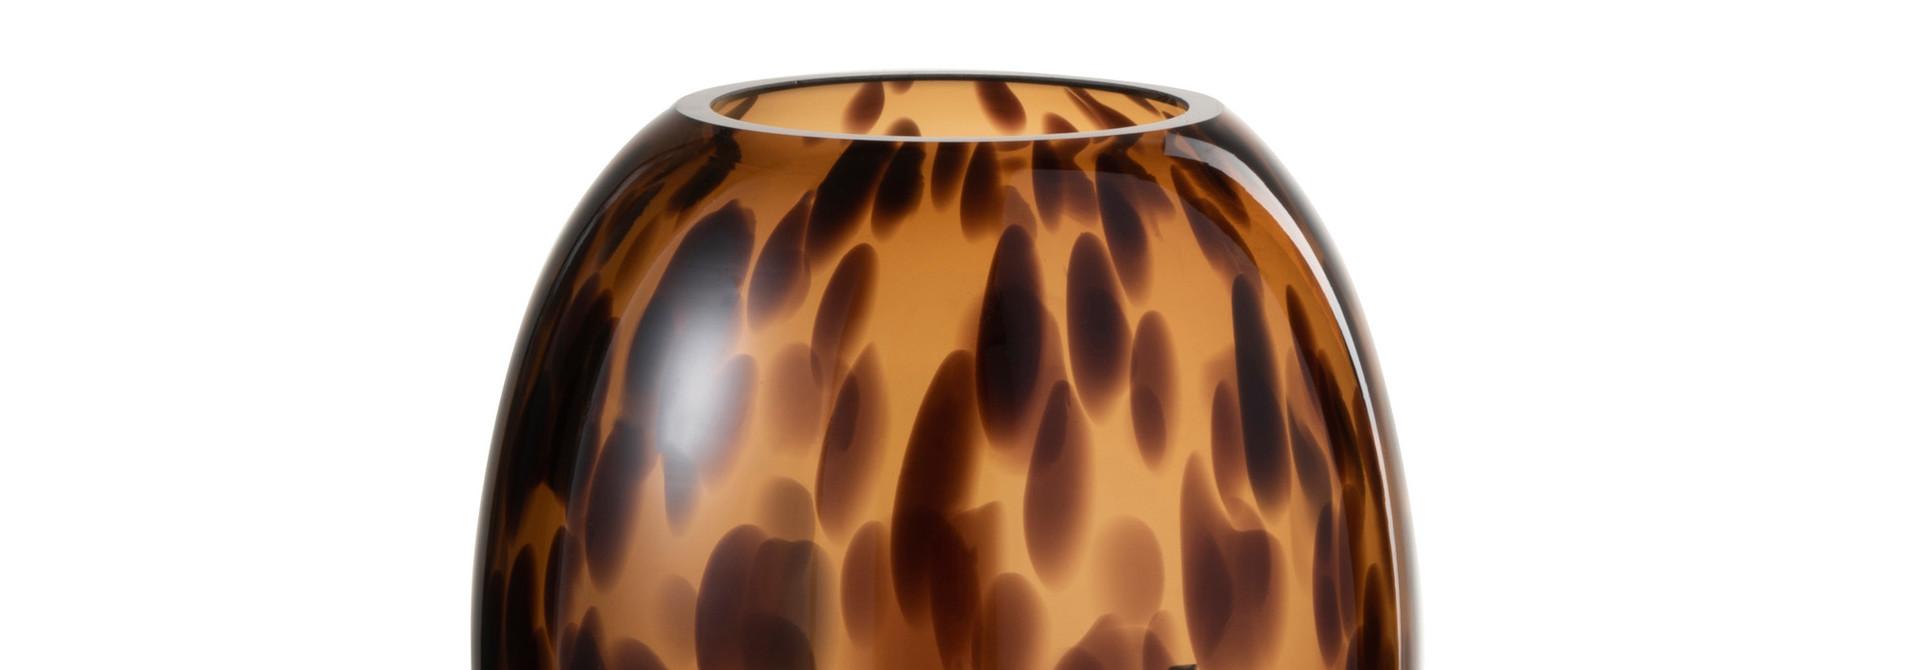 Vaas Op Voet Spikkel Glas Transparant/Bruin Small